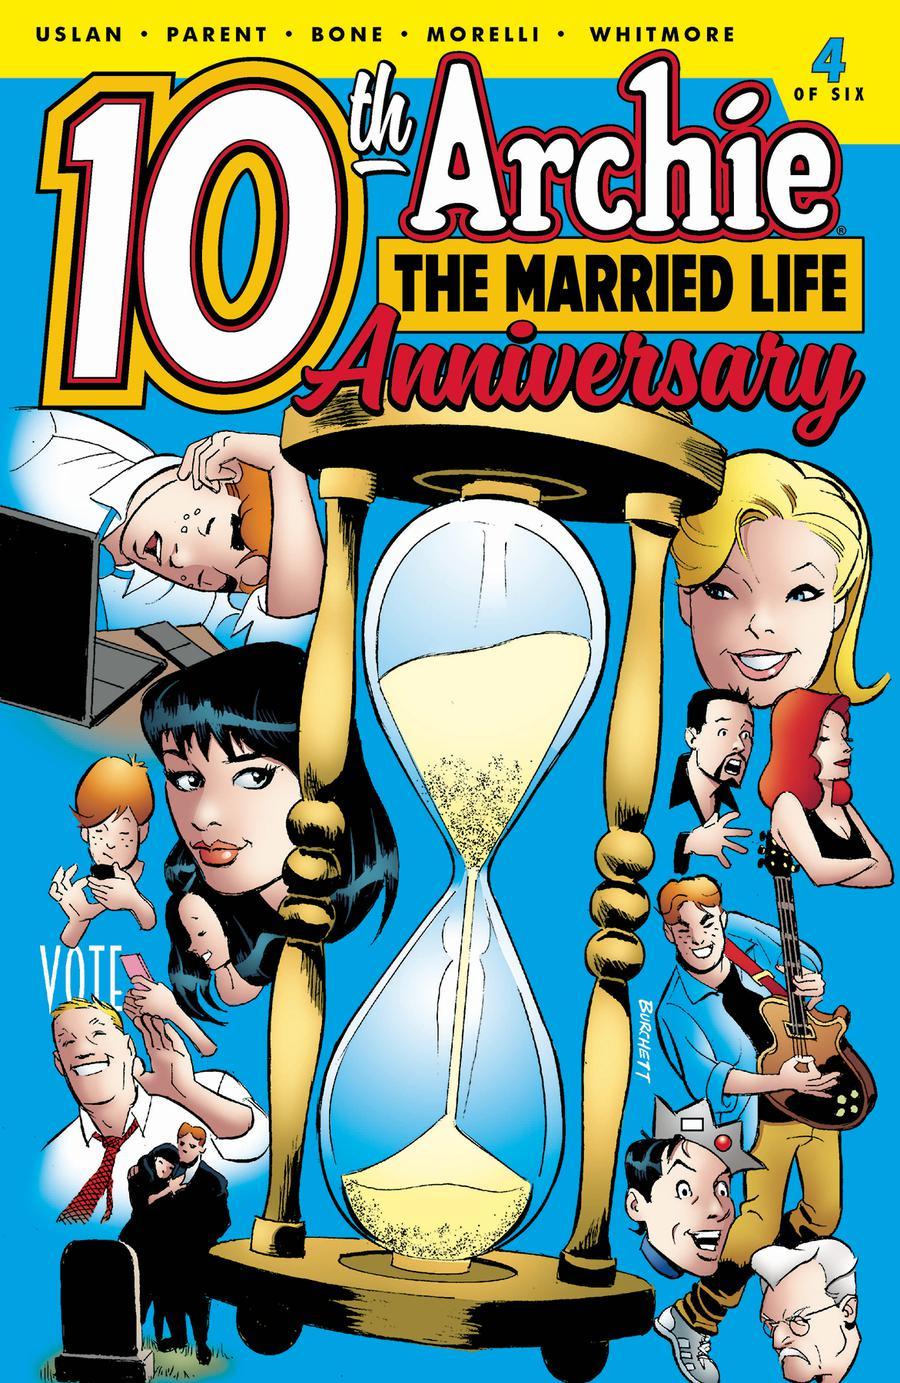 Archie The Married Life 10th Anniversary #4 Cover B Variant Rick Burchett & Glenn Whitmore Cover